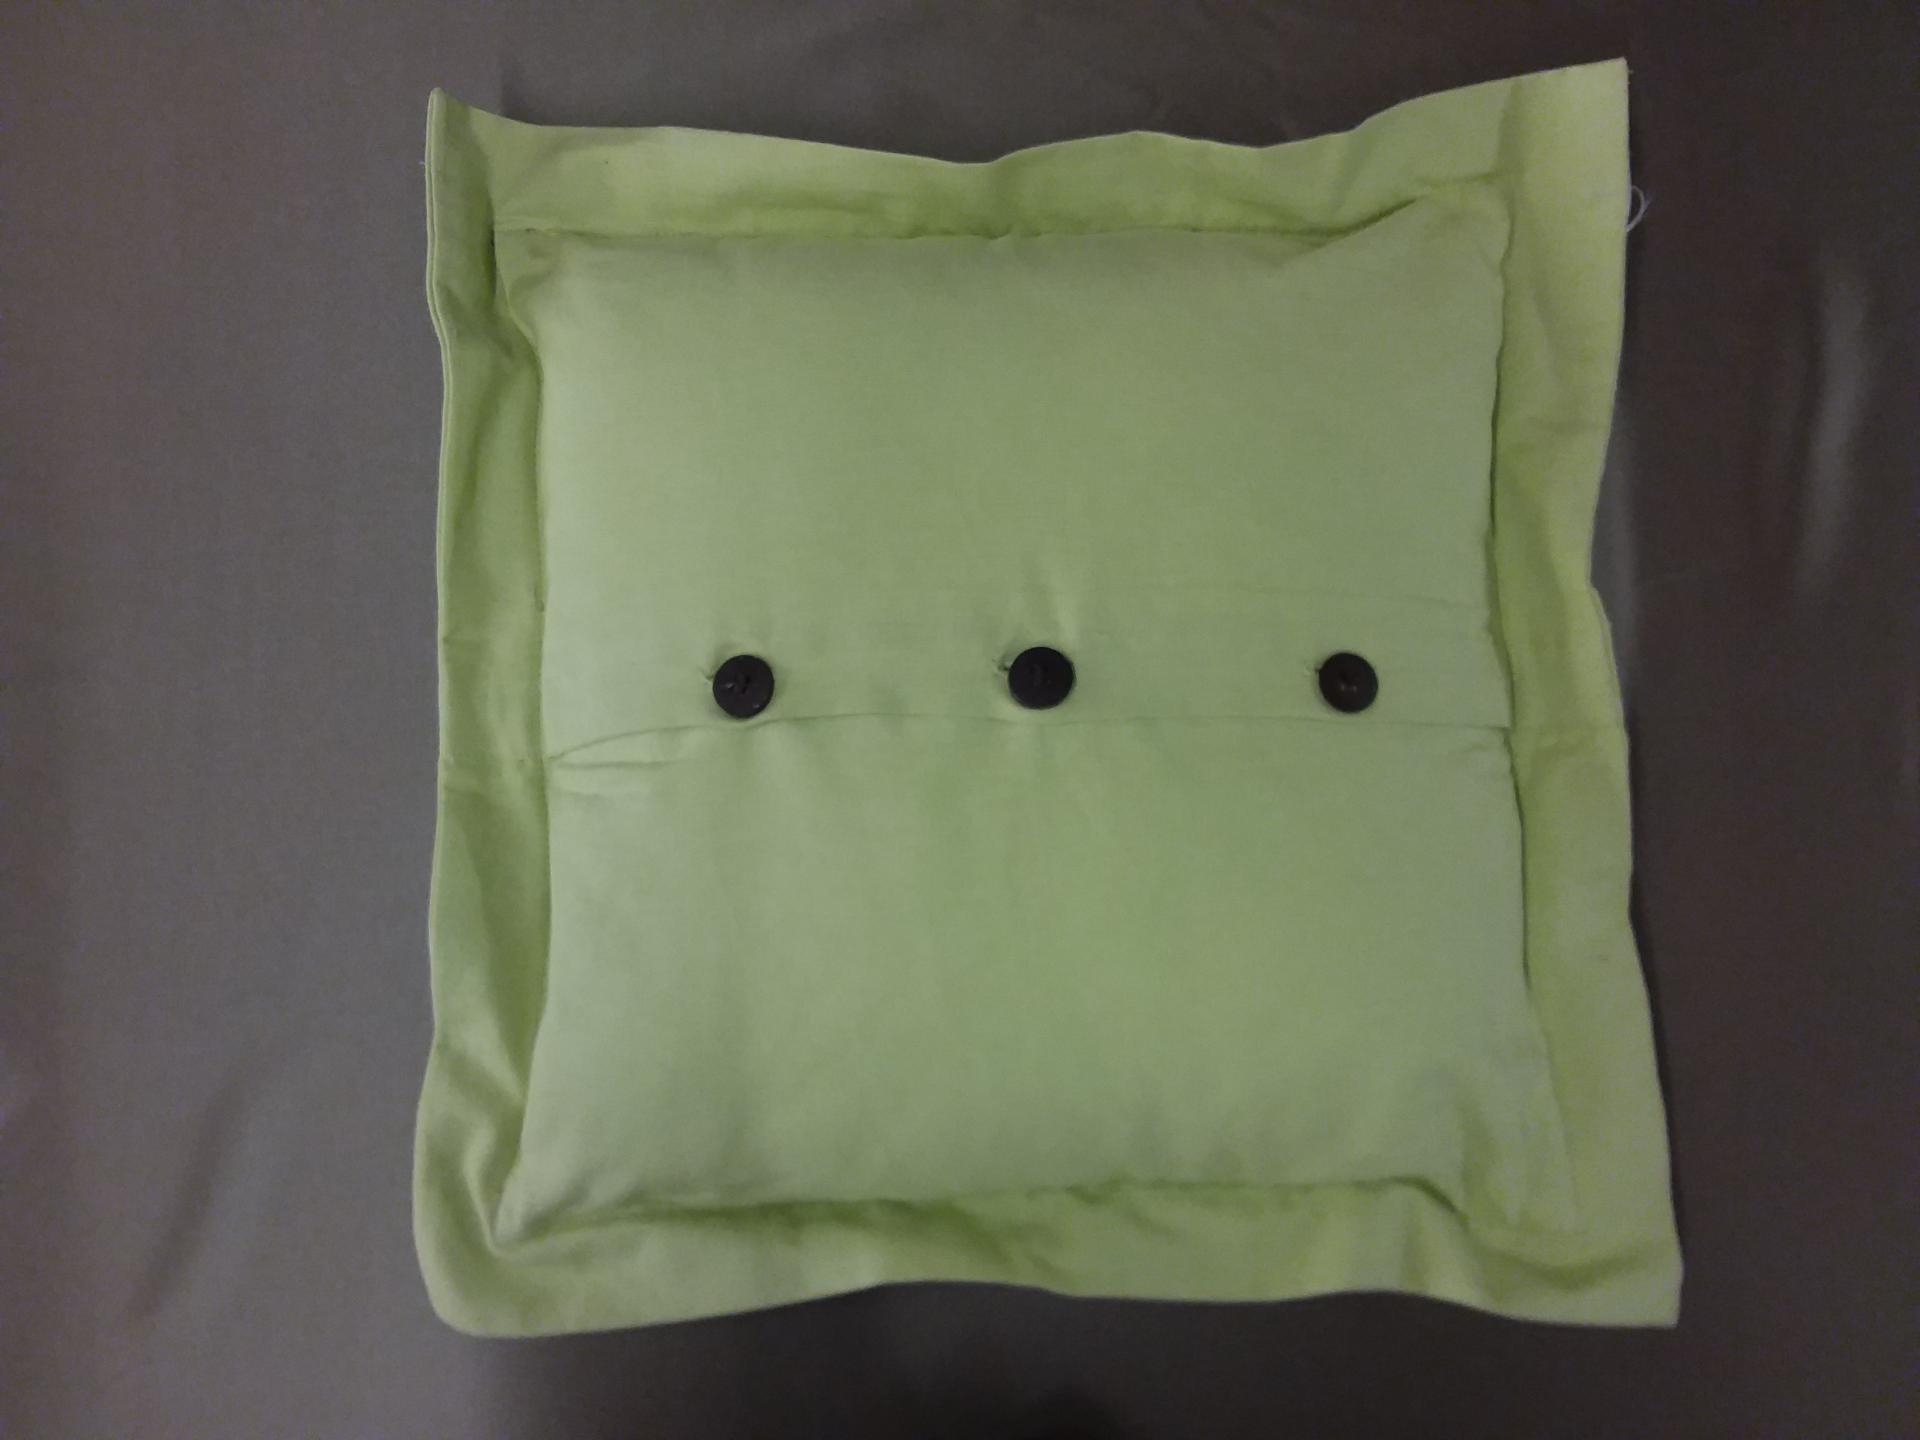 Coussine vert recto